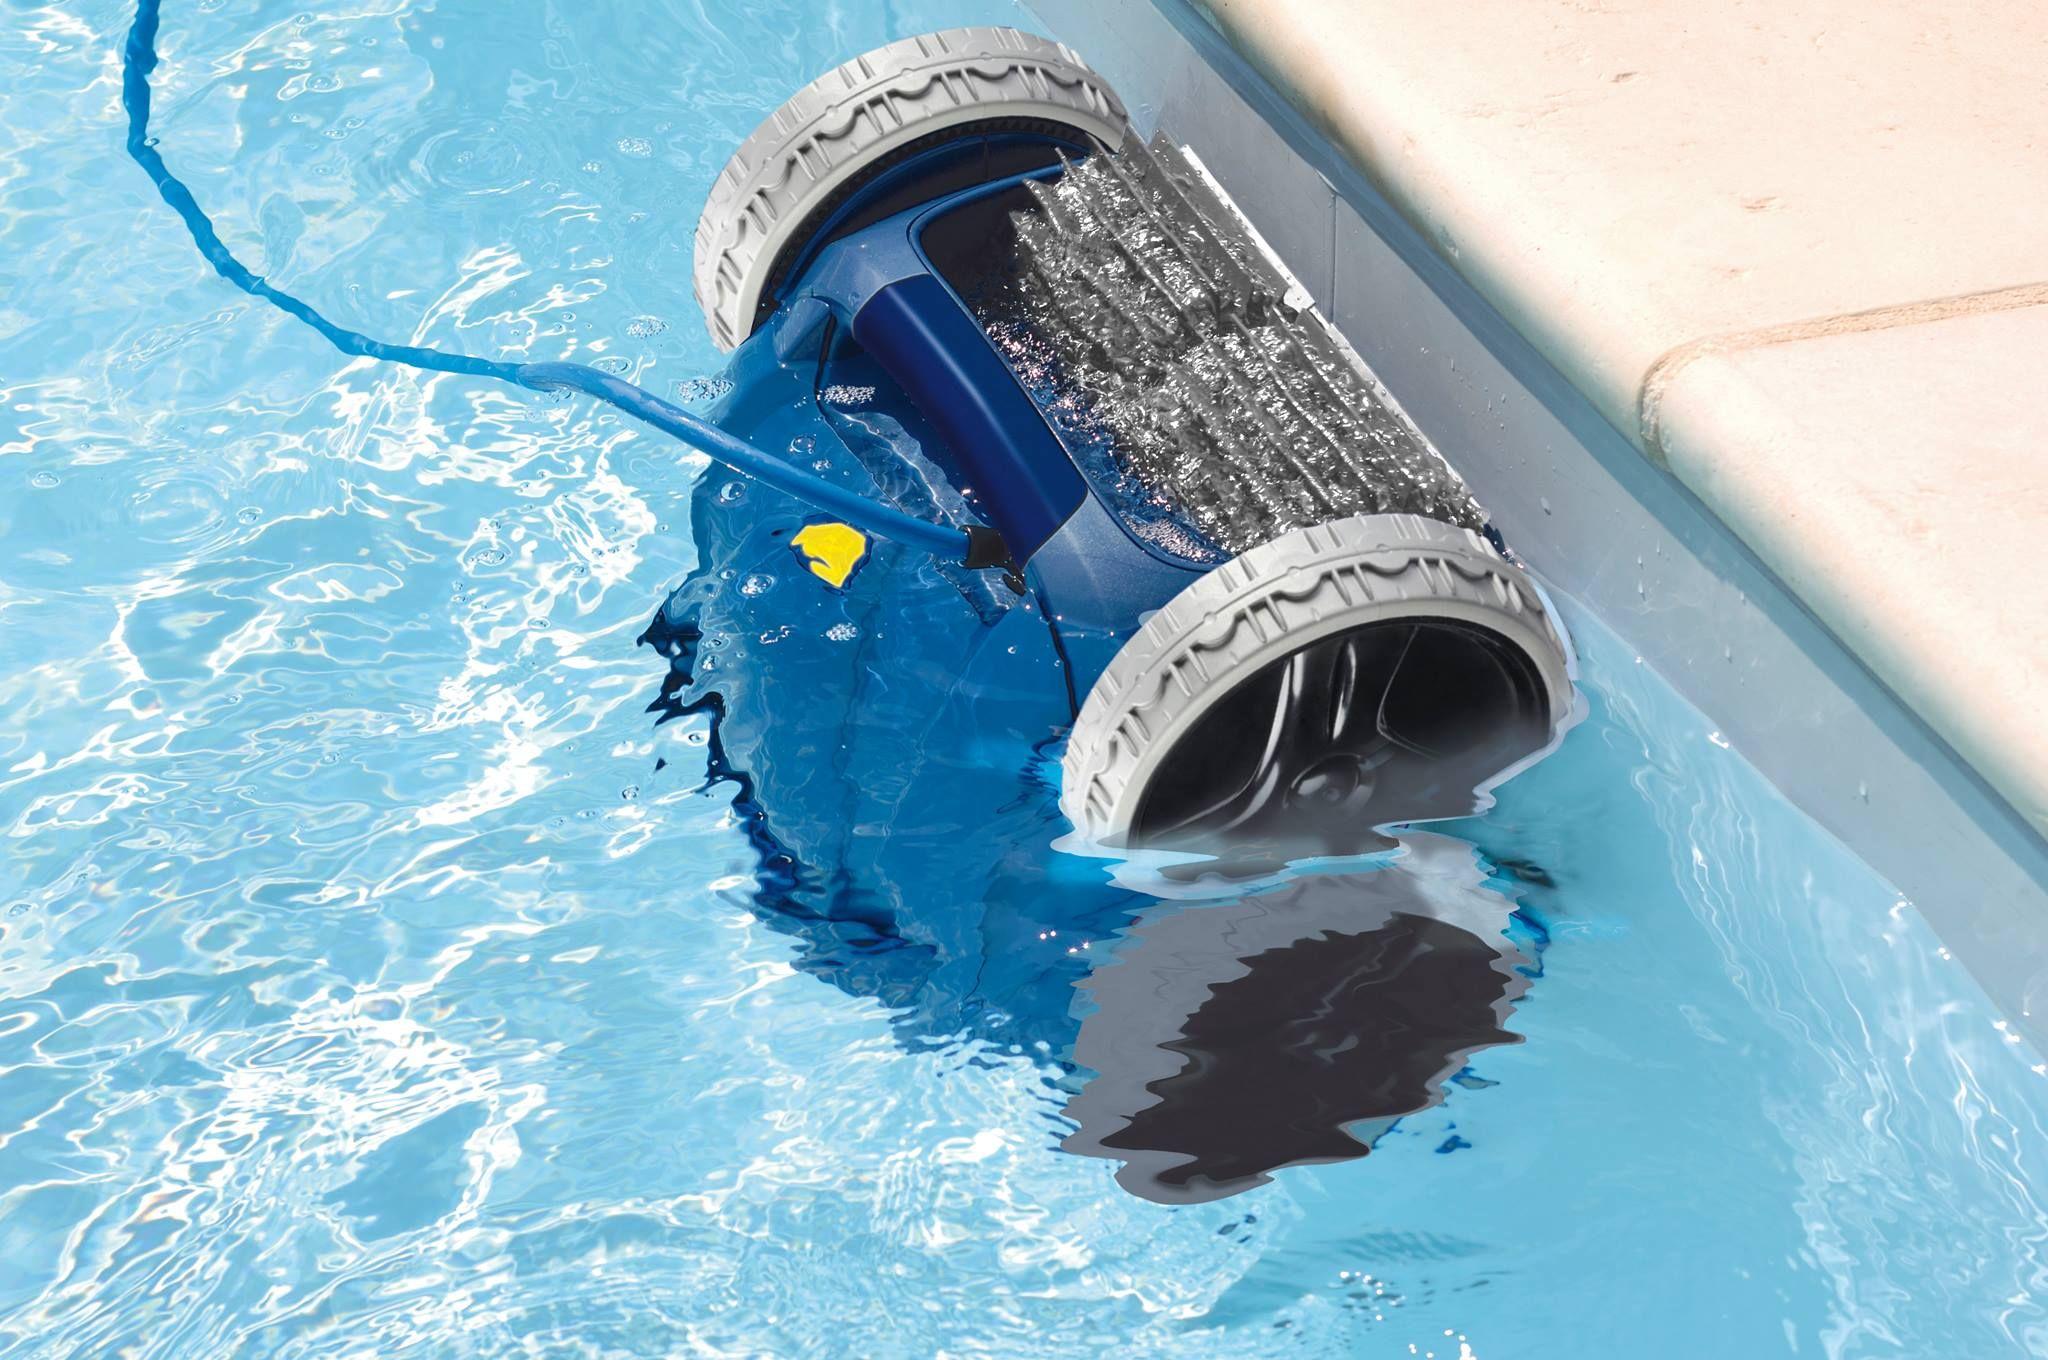 Pin by Bradley VanCleef on Jaxon | Robotic pool cleaner, Swimming ...